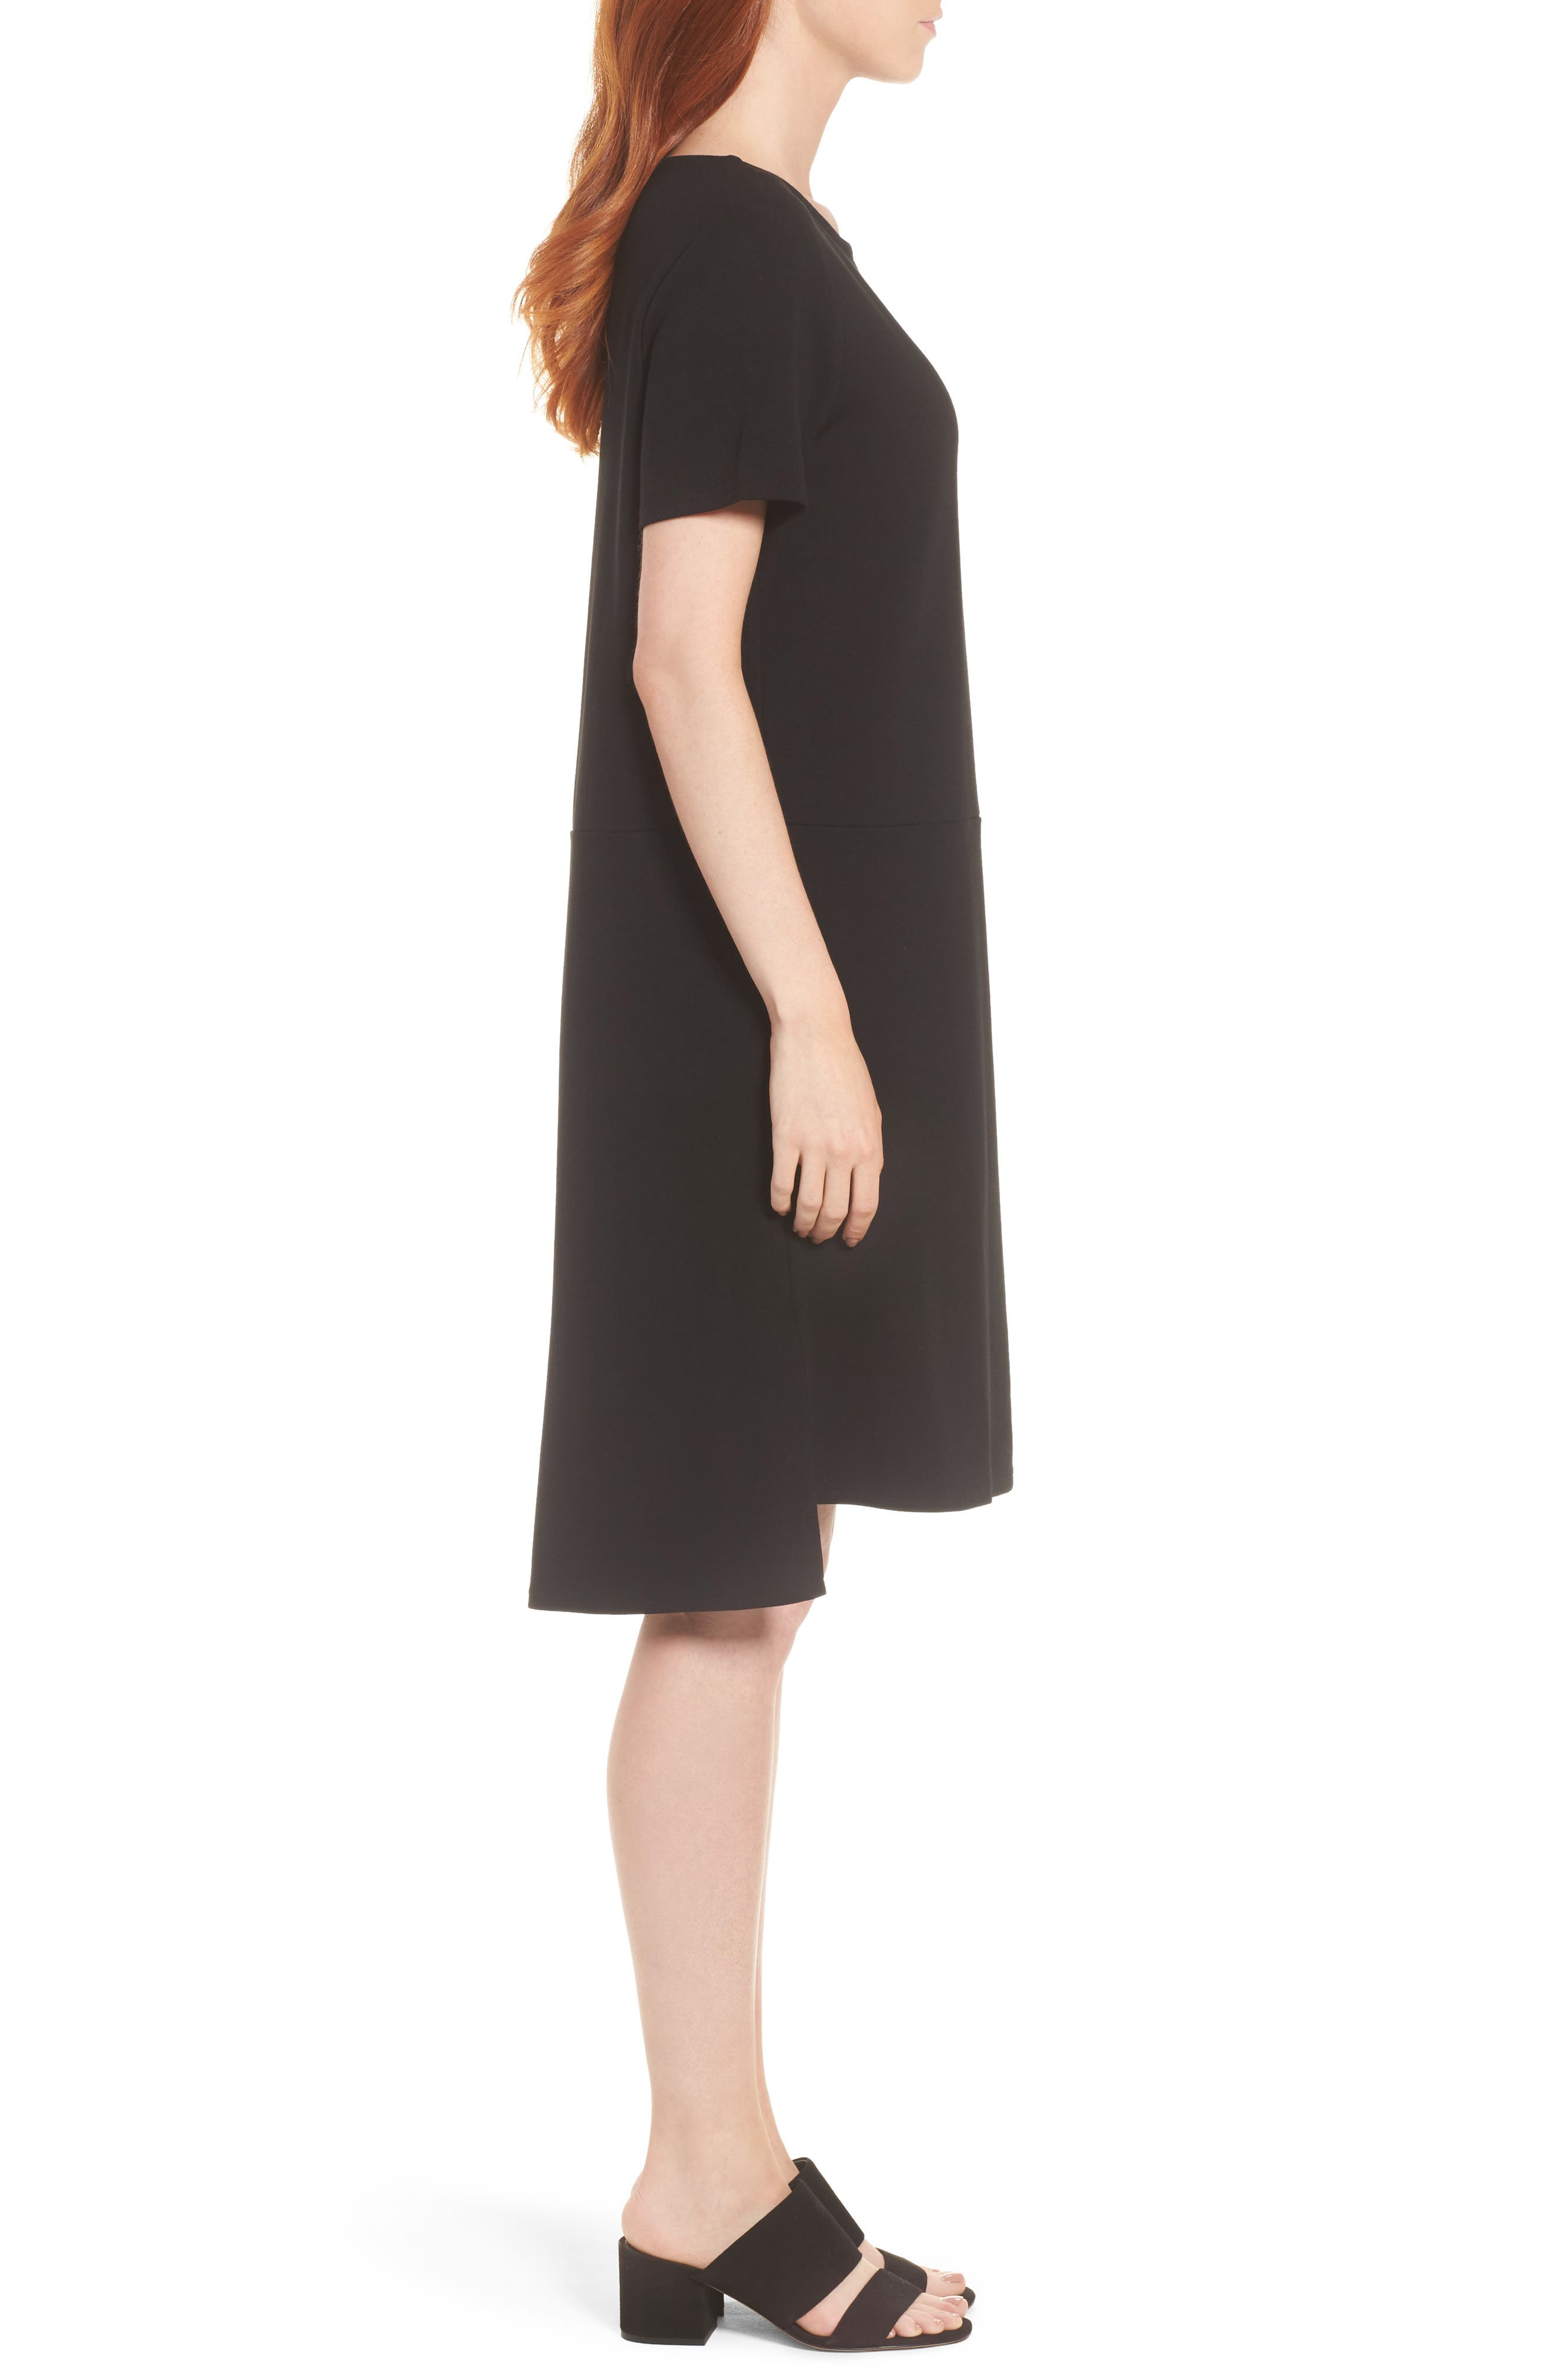 Tencel<sup>®</sup> Lyocell Blend Knit Shift Dress,                             Alternate thumbnail 3, color,                             Black